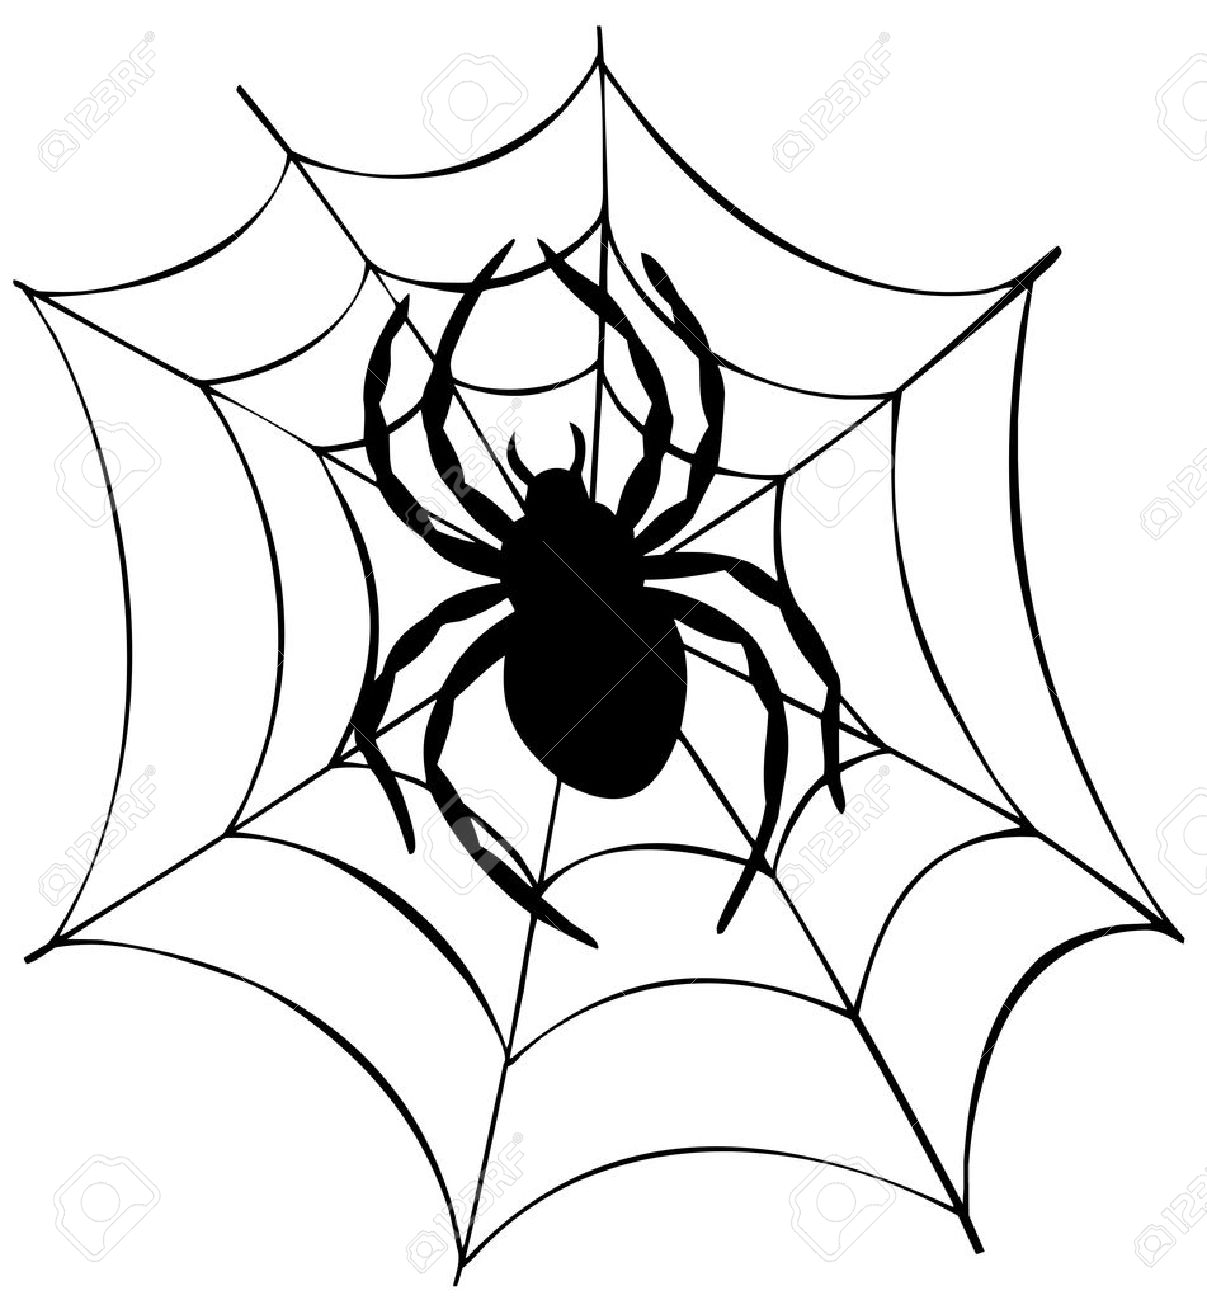 Drawn spider web silhouette In Silhouette Spider : Web